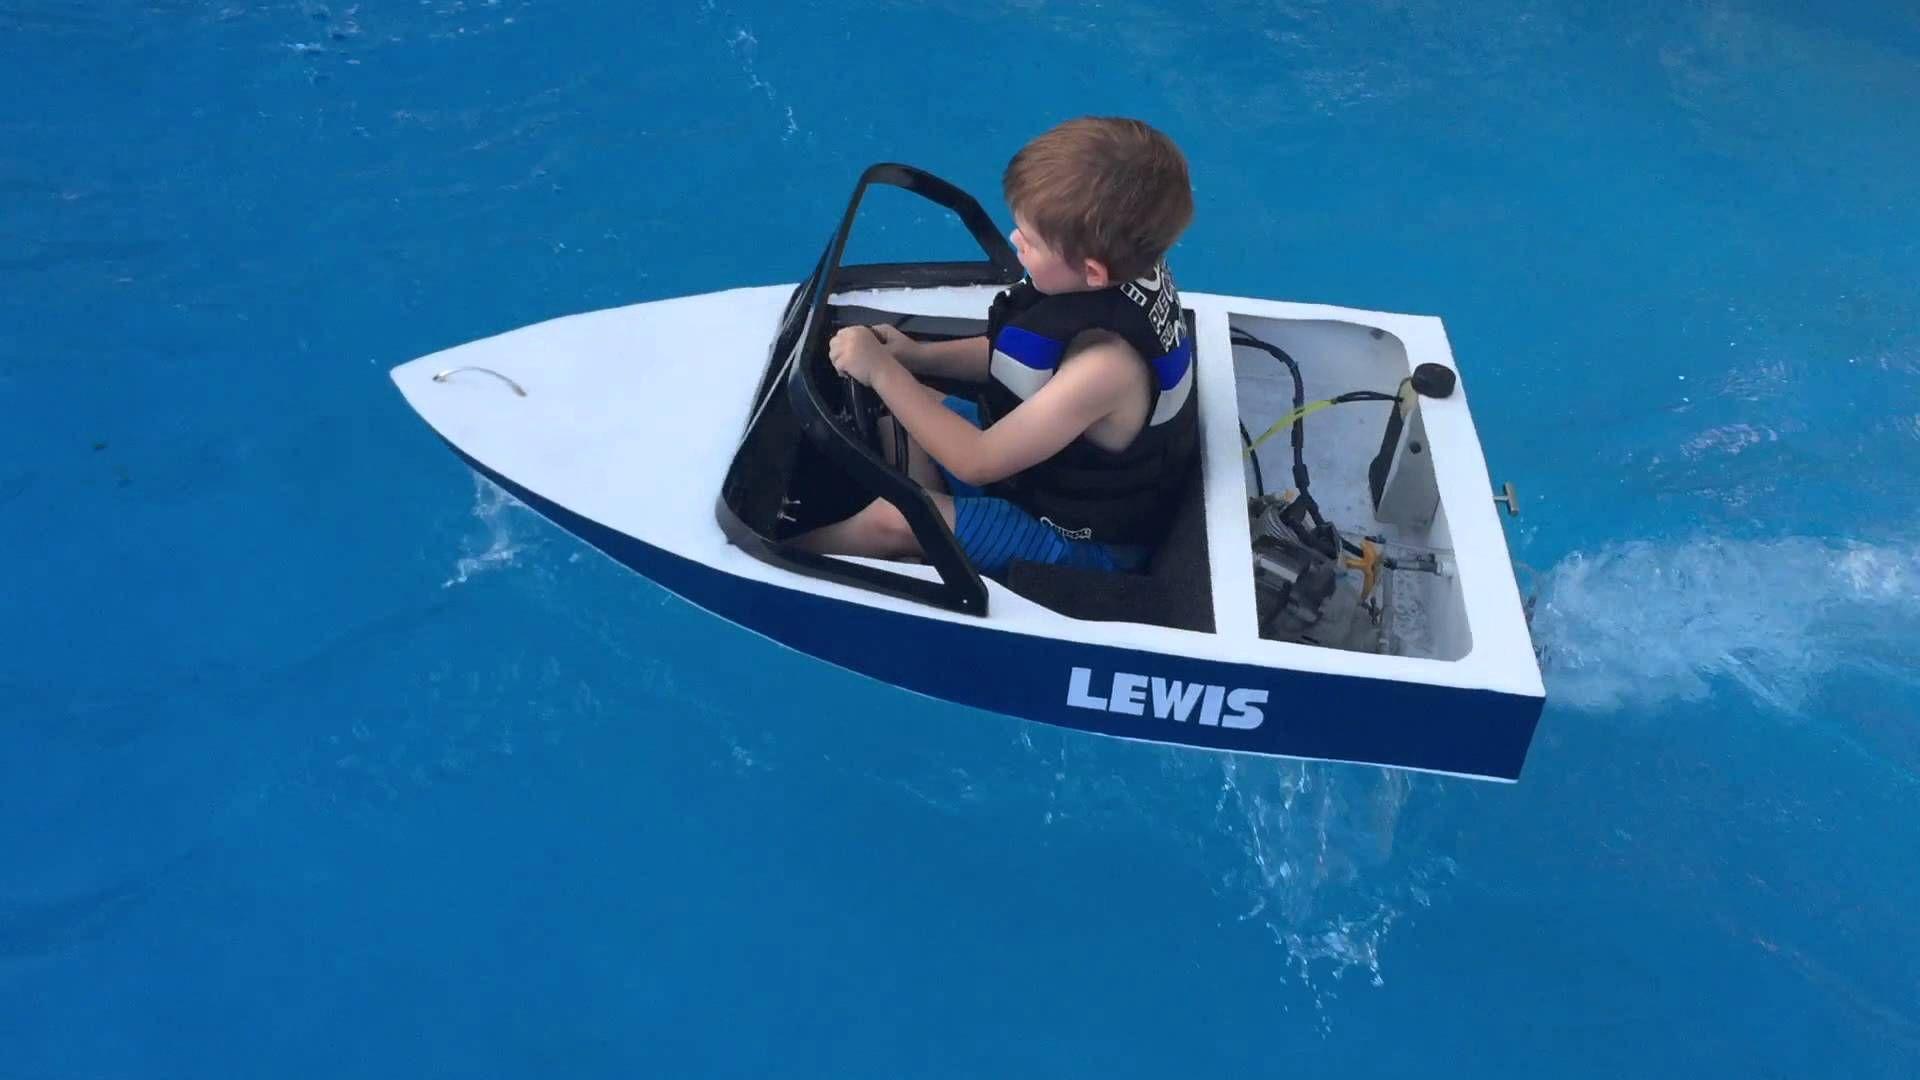 Mini Ski Boat Build Petrol Powered Wooden Boat